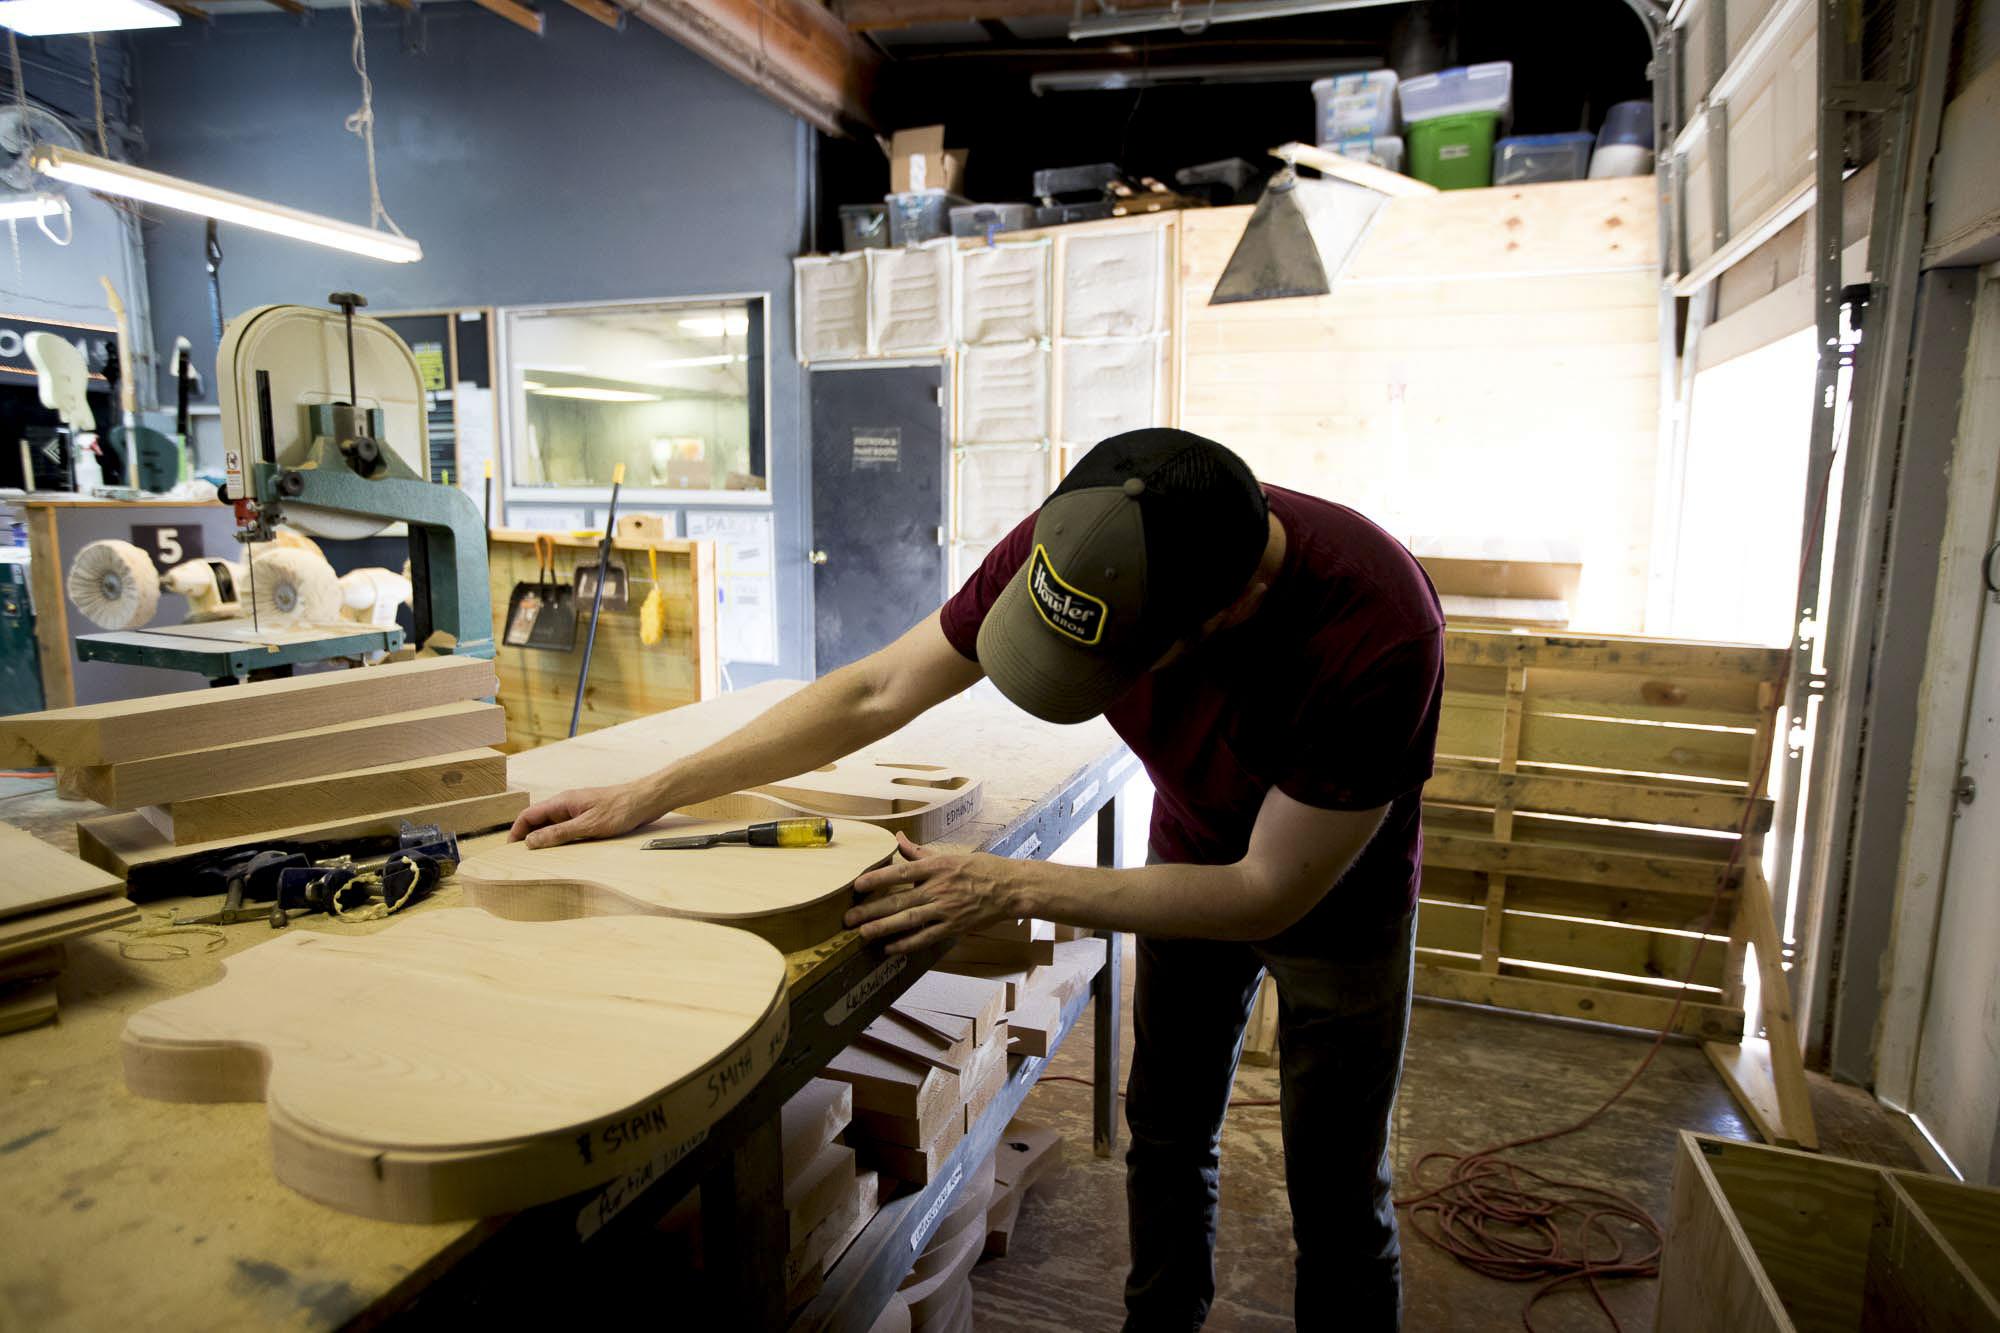 top-portrait-photographer-austin-texas-bailey-toksoz-photography-SMALL-BUSINESS-PHOTOGRAPHY-IN-AUSTIN-TEXAS-28.JPG